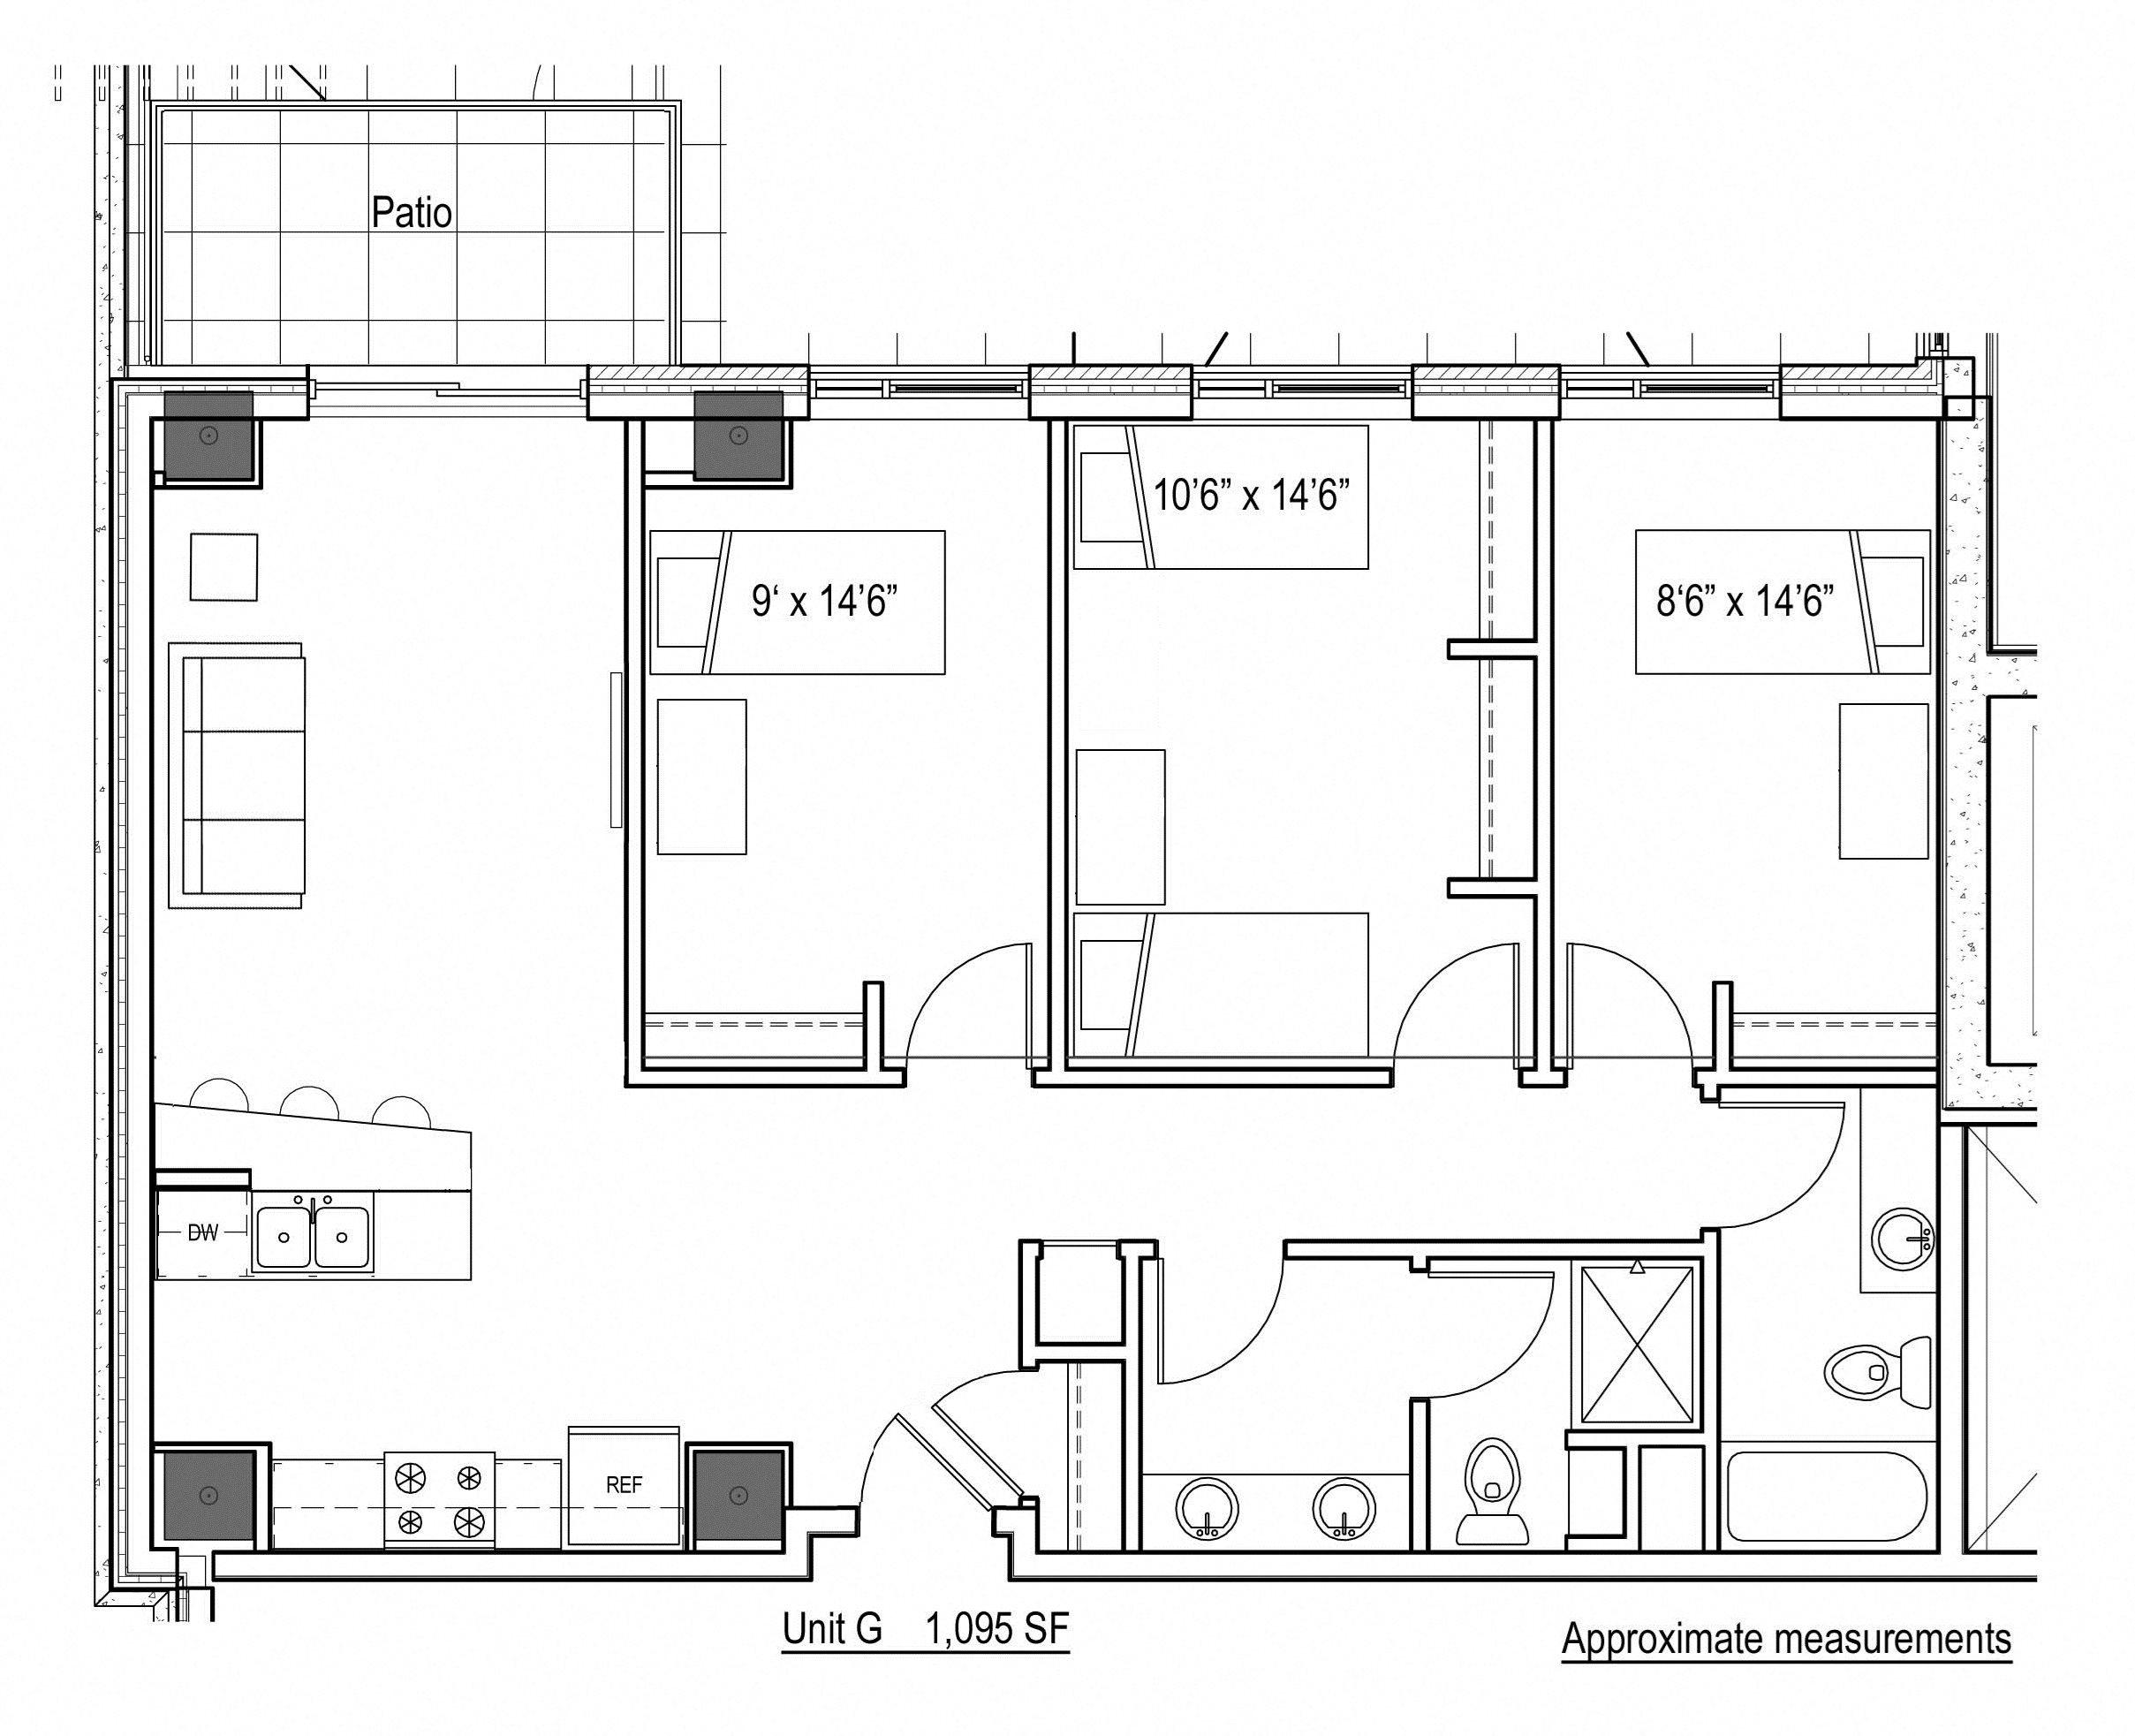 g fridge dometic rv renovation img gasket silhouette floor